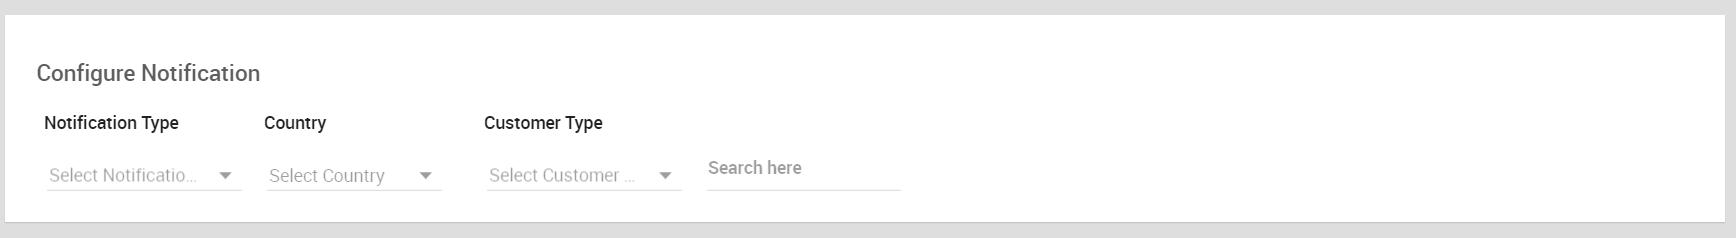 Configure Notification section